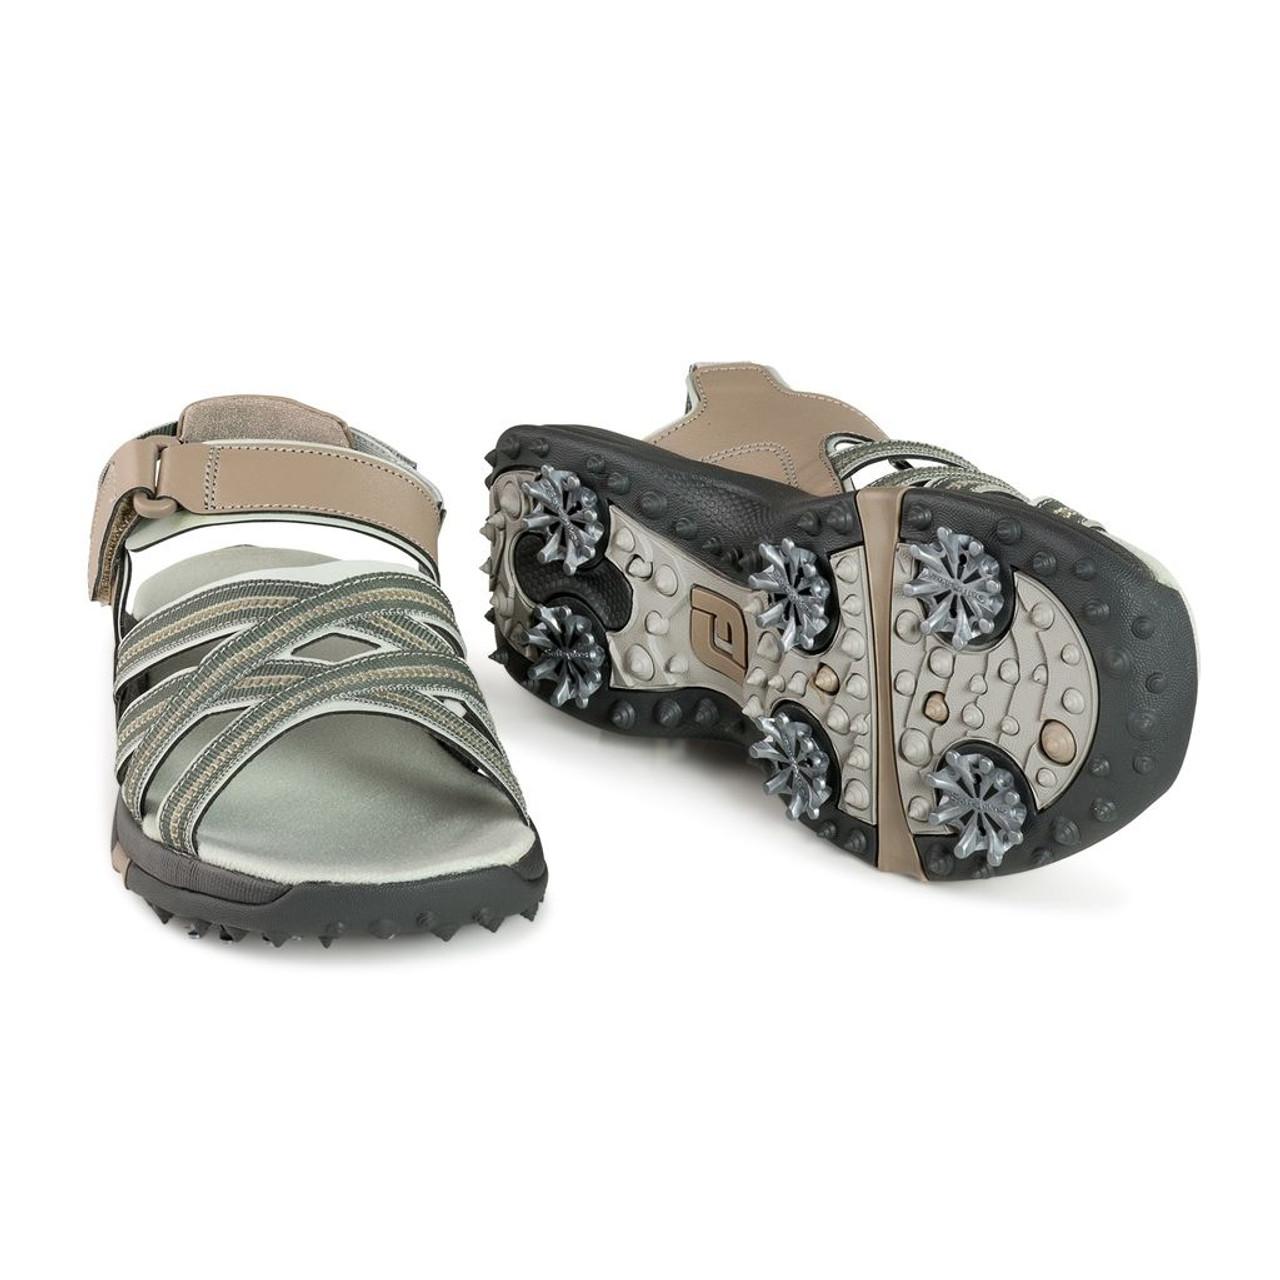 FootJoy Womens Golf Sandals - Tan / Light Grey (48446)